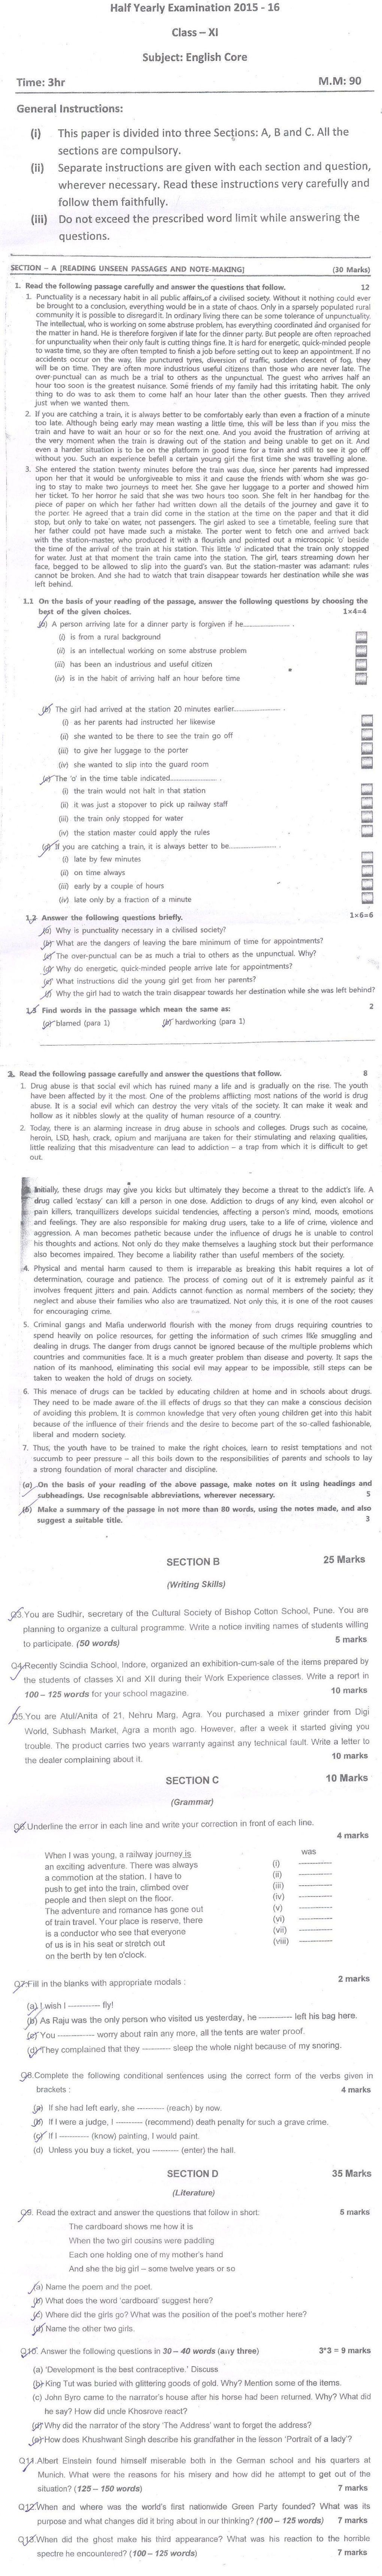 Ncert Textbook In English For Class 11 Hornbill .pdf